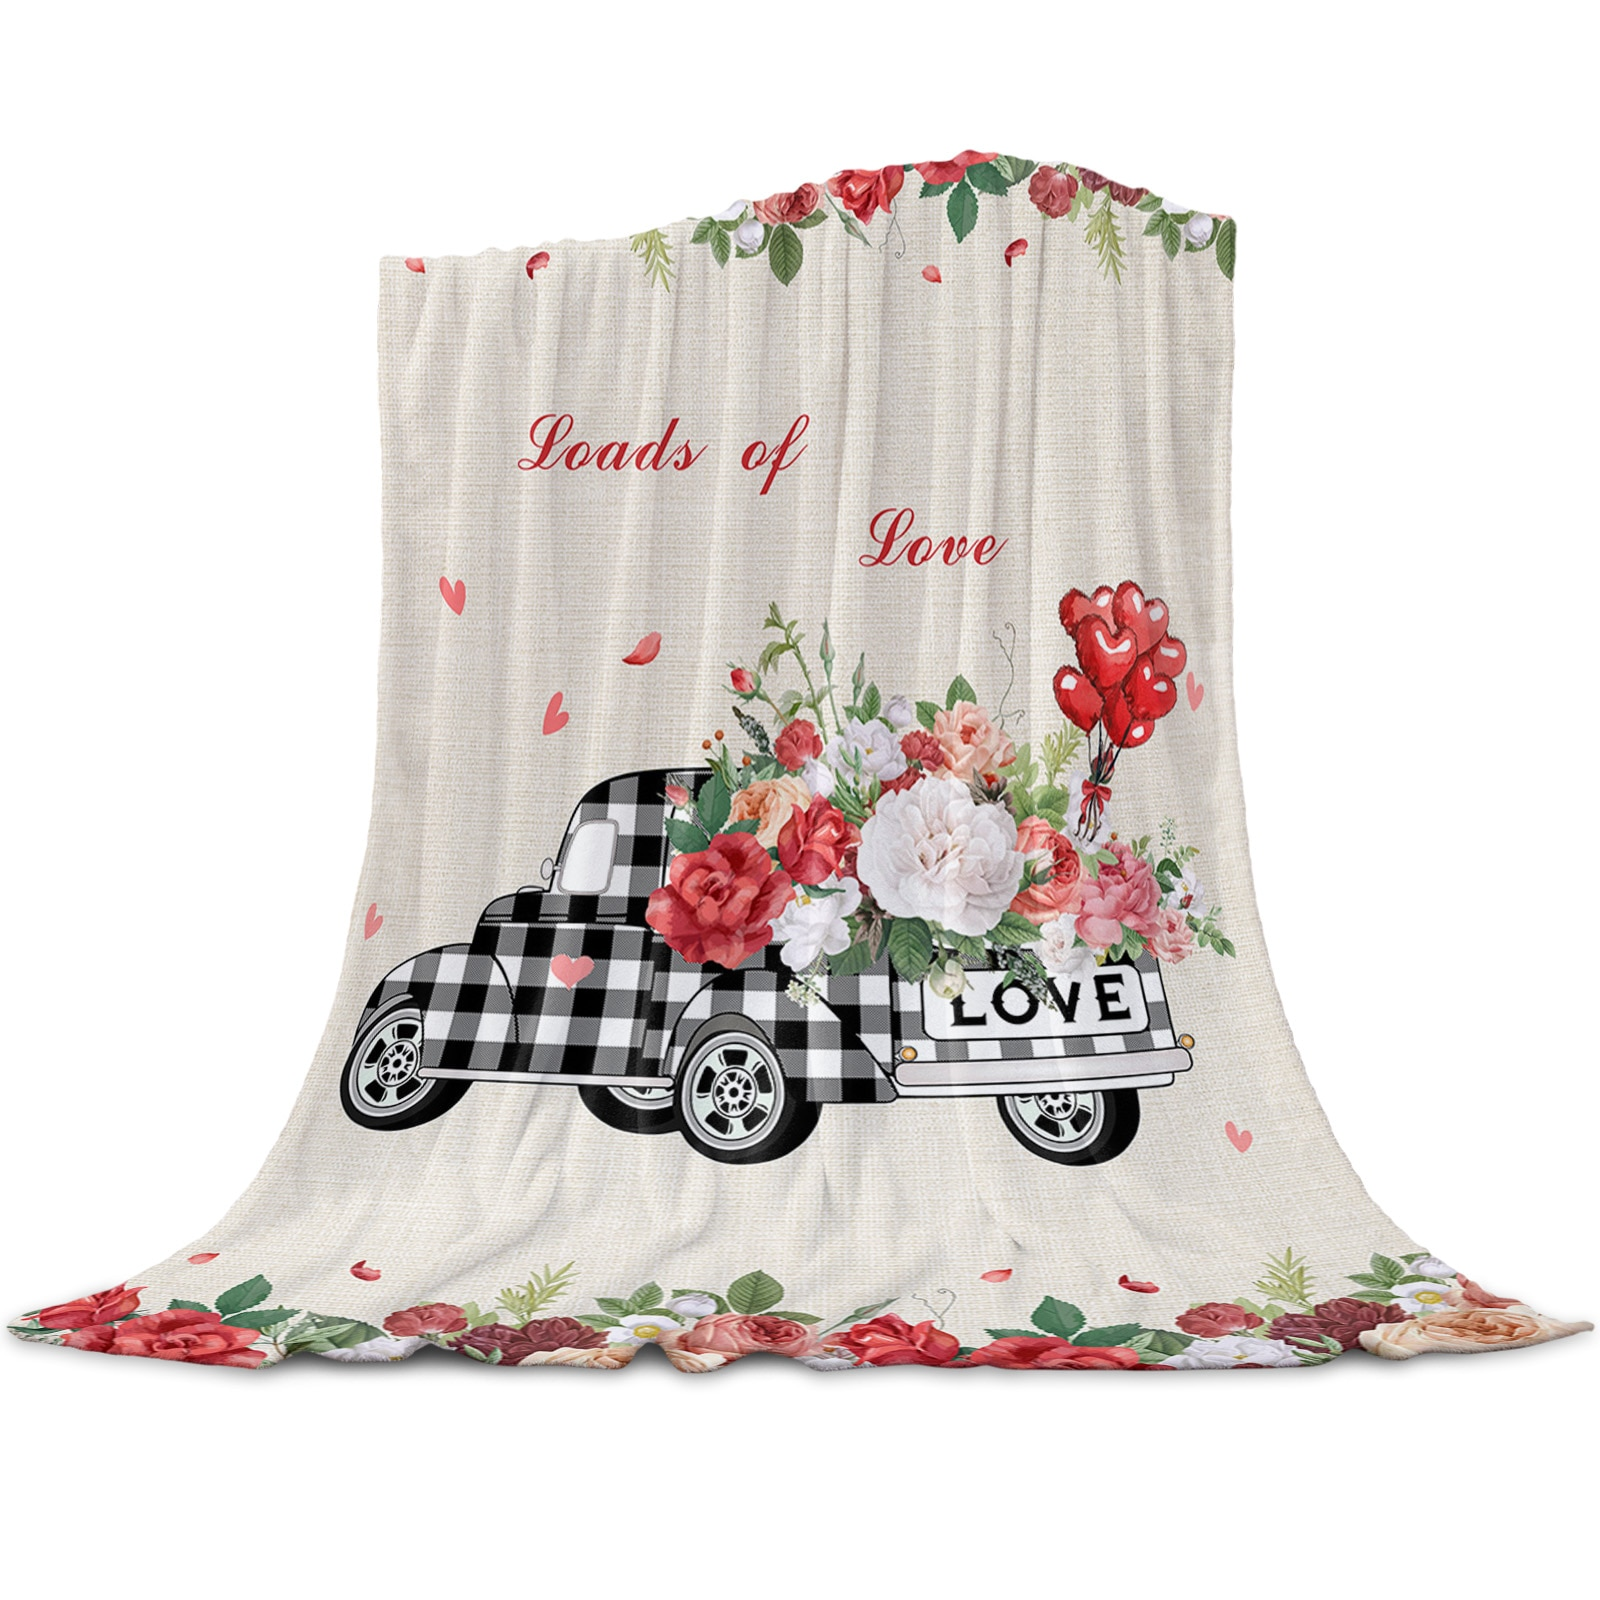 Valentine Truck Roses Throw Blanket for Beds Microfiber Flannel Warm Blanket Sofa Bedding Bedspread Gifts